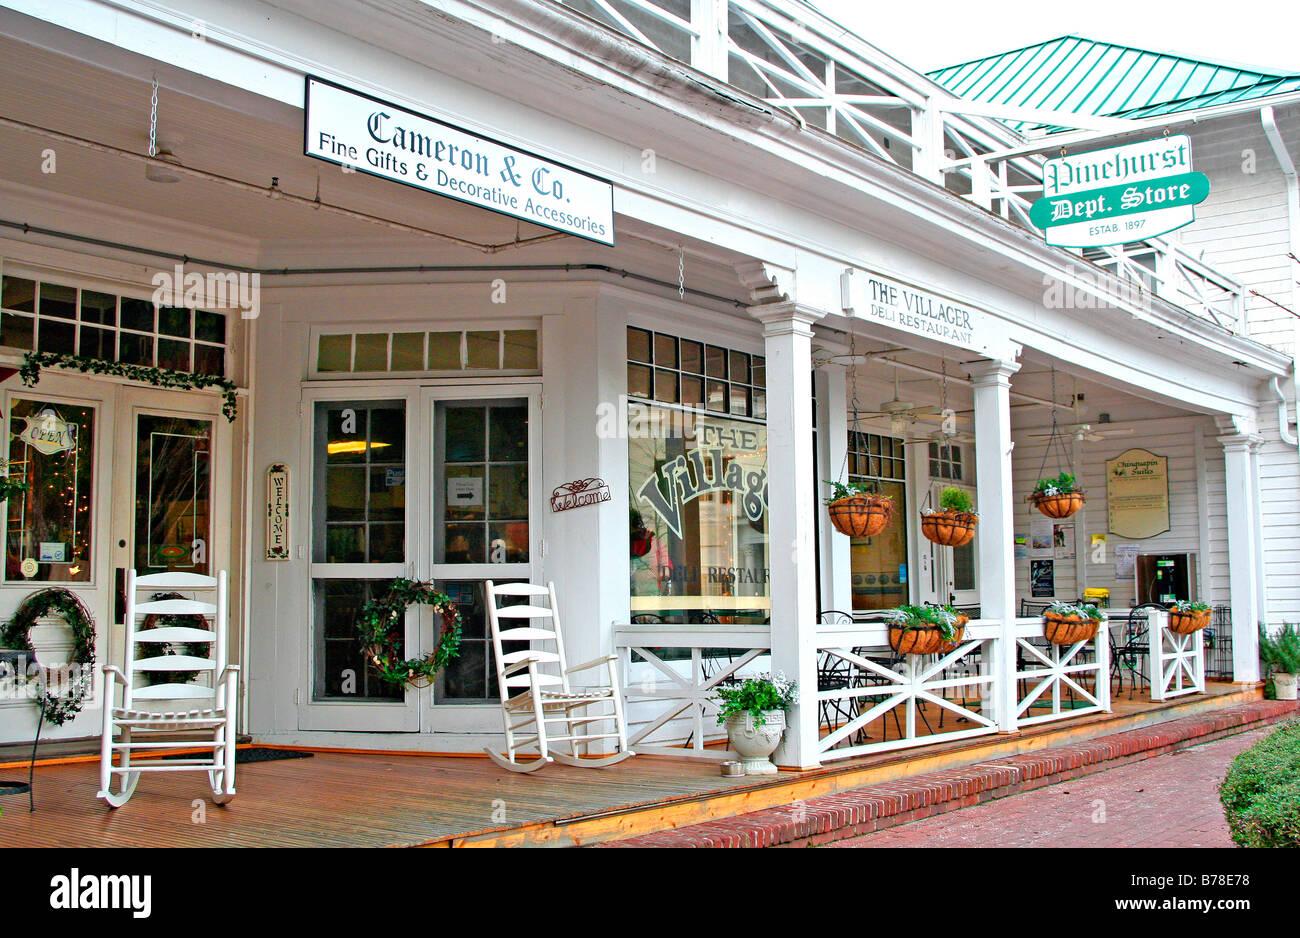 Department store and shops Pinehurst North Carolina - Stock Image